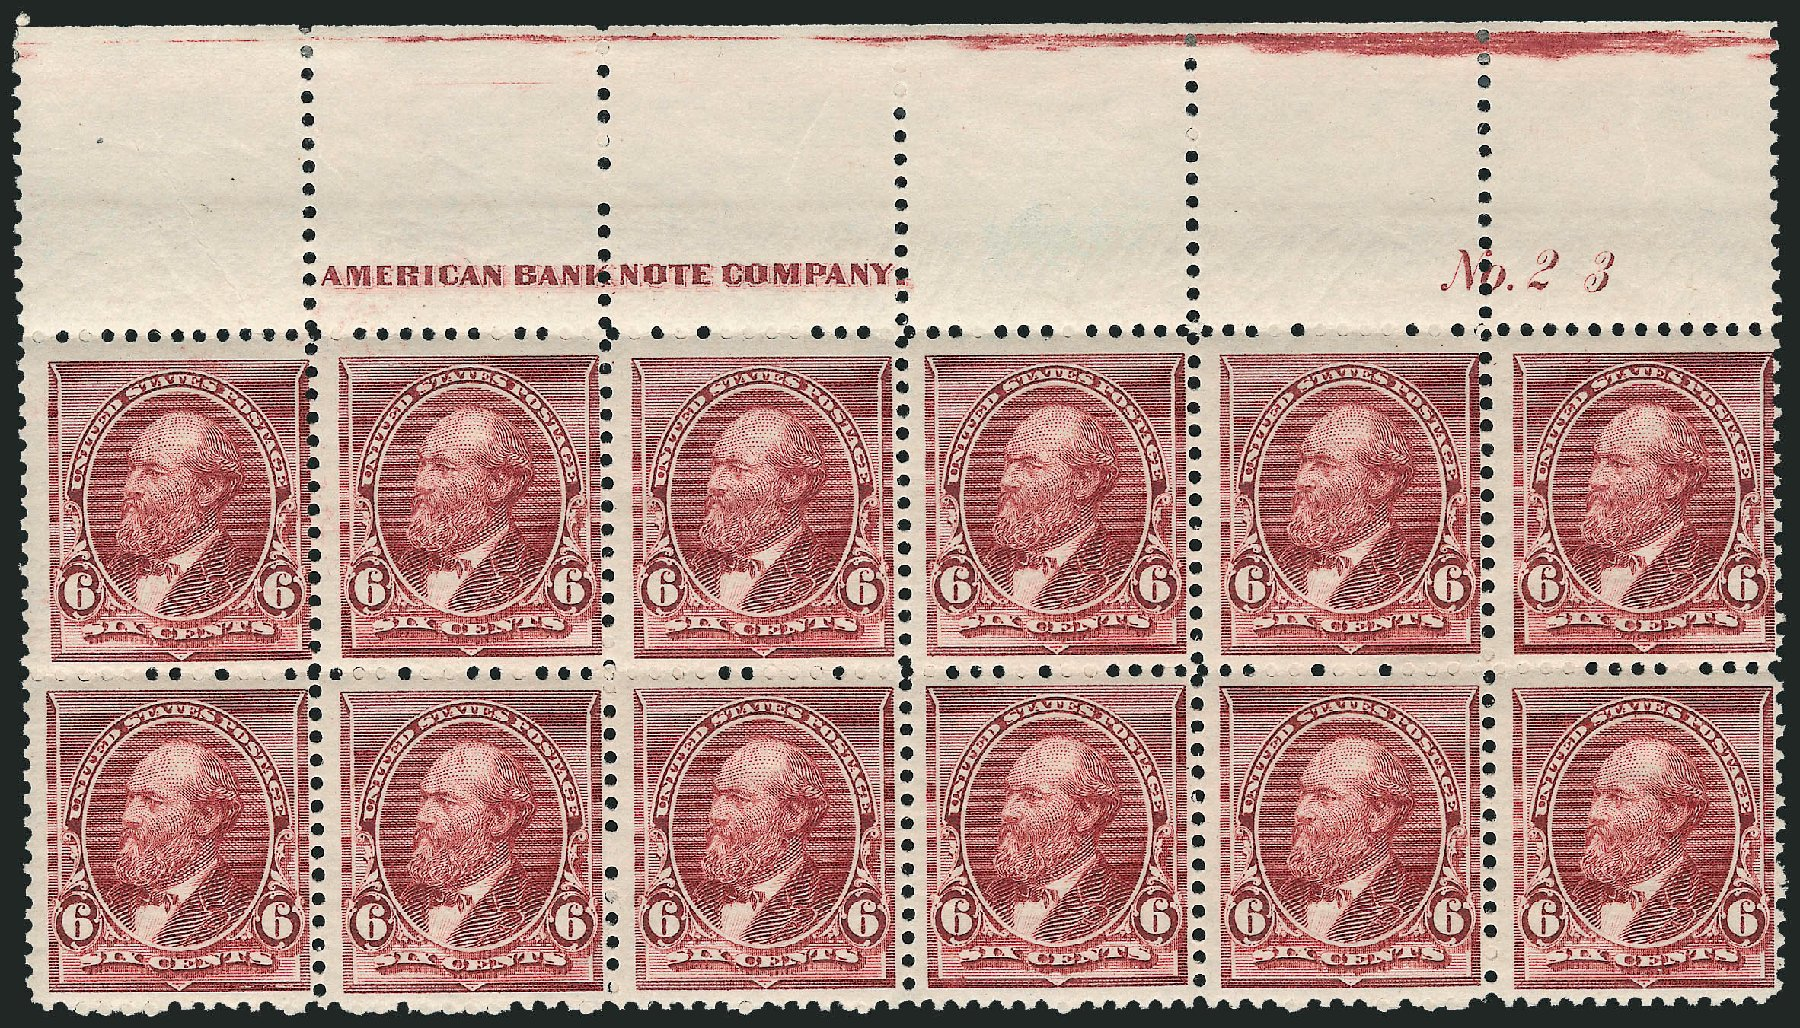 US Stamps Price Scott Cat. #224: 6c 1890 Garfield. Robert Siegel Auction Galleries, Apr 2015, Sale 1096, Lot 389